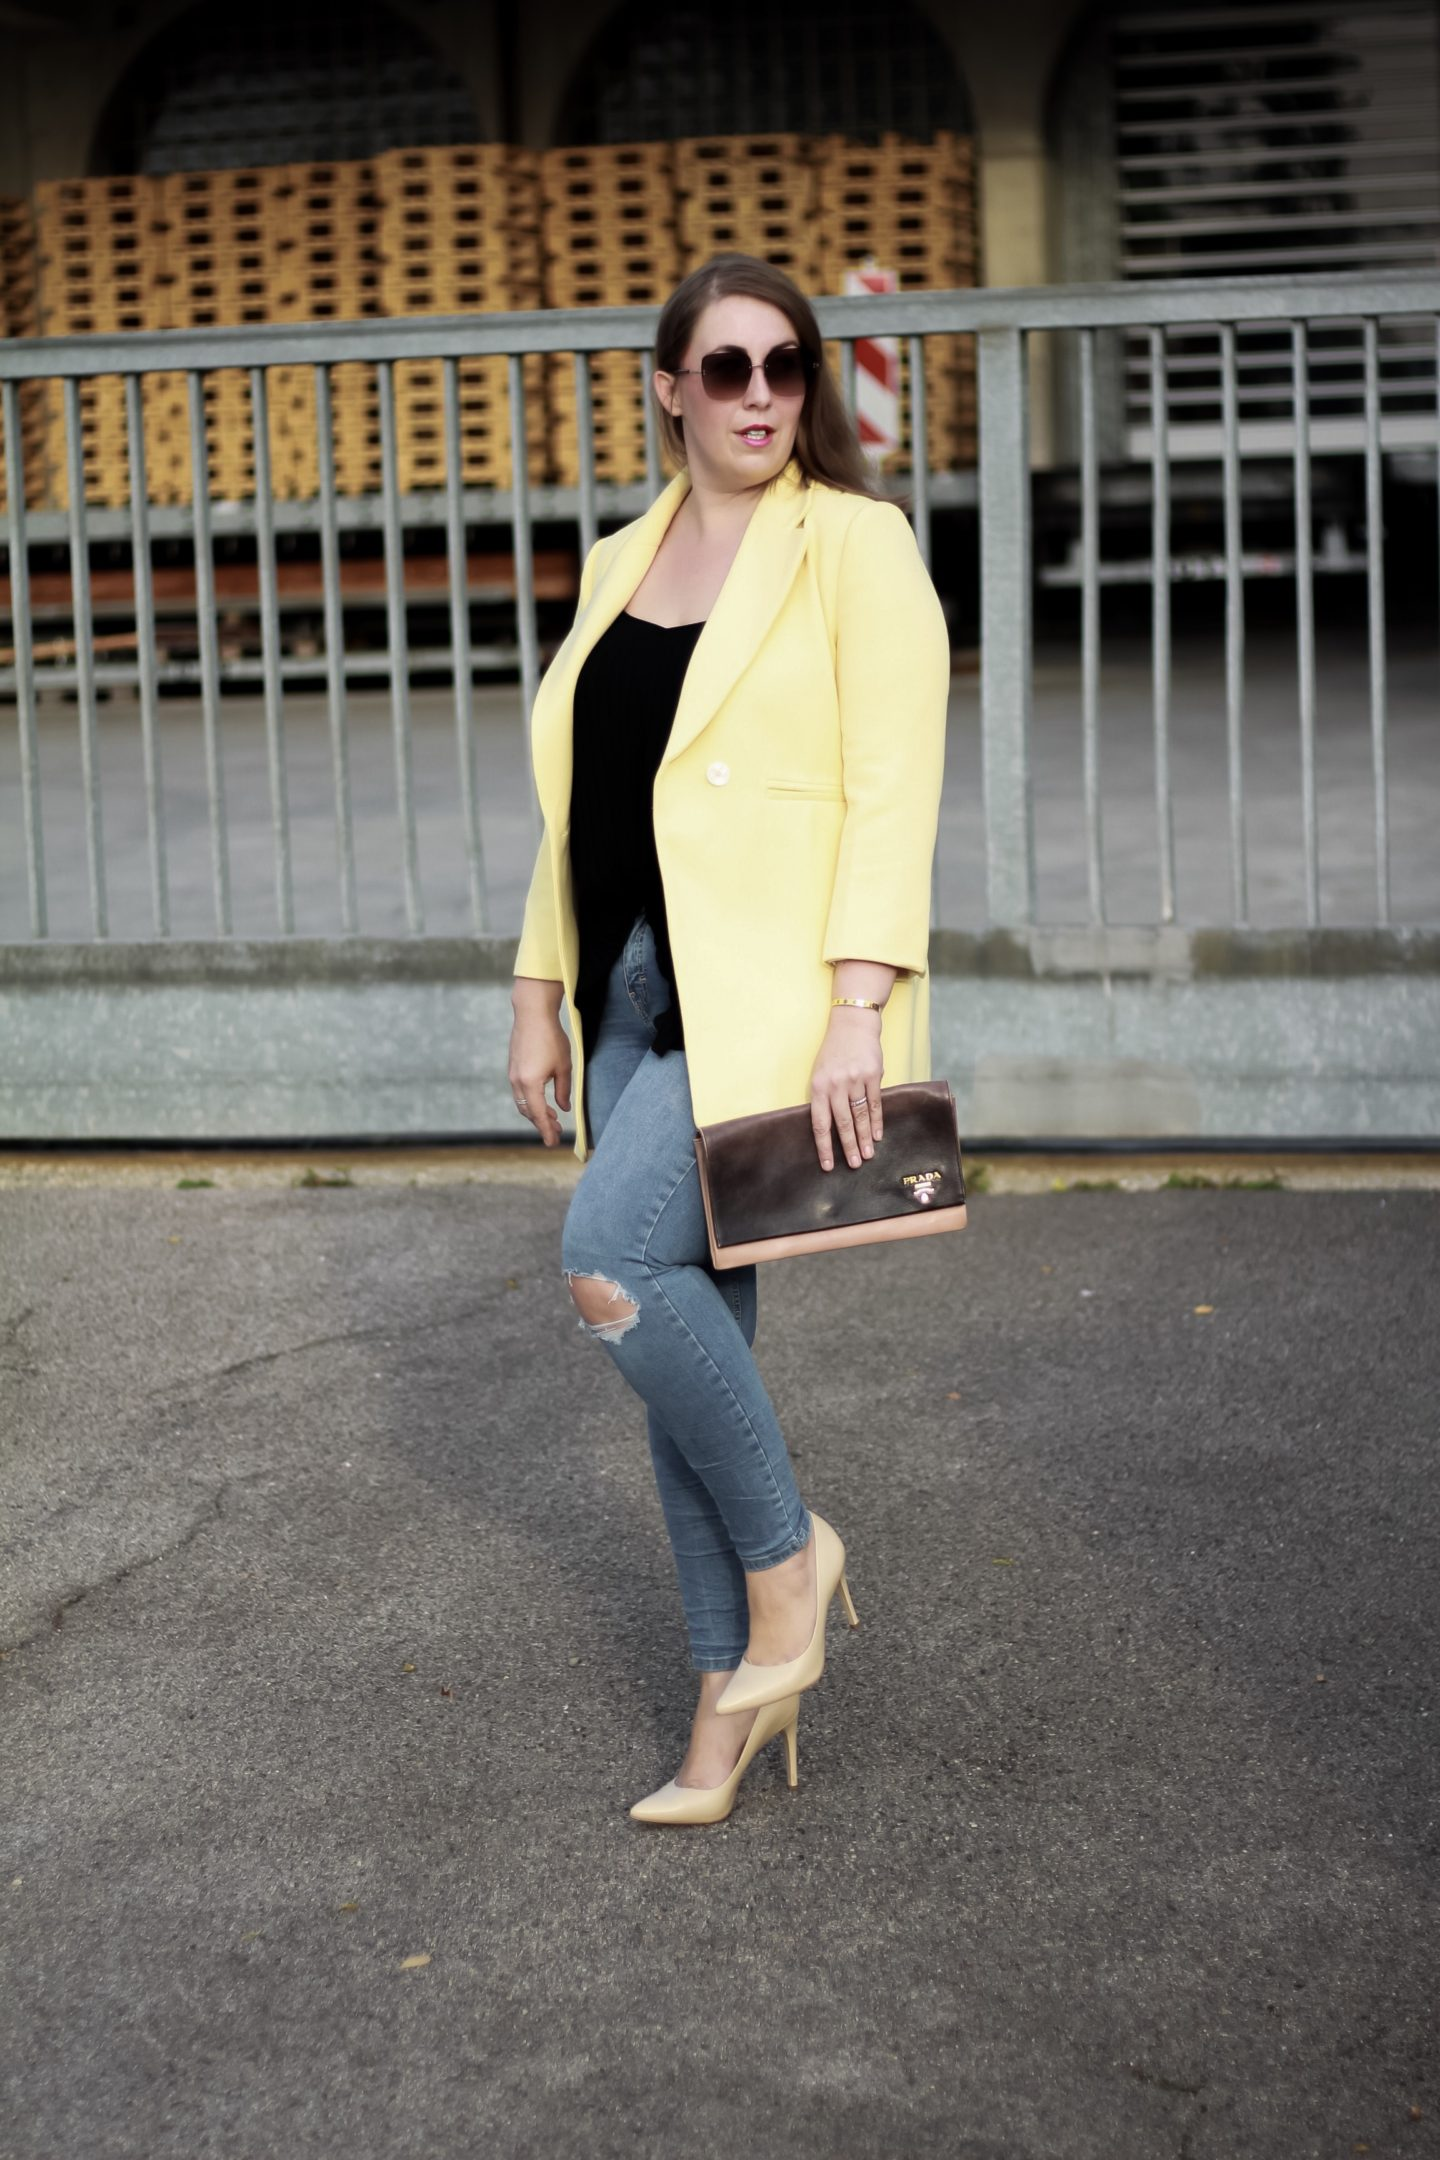 Miss-Suzie-Loves-Susanne-Heidebach-Blazer-gelb-Ripped-Jeans-Fashionblogger-Prada-Clutch-Kate-Spade-Brille.JPG